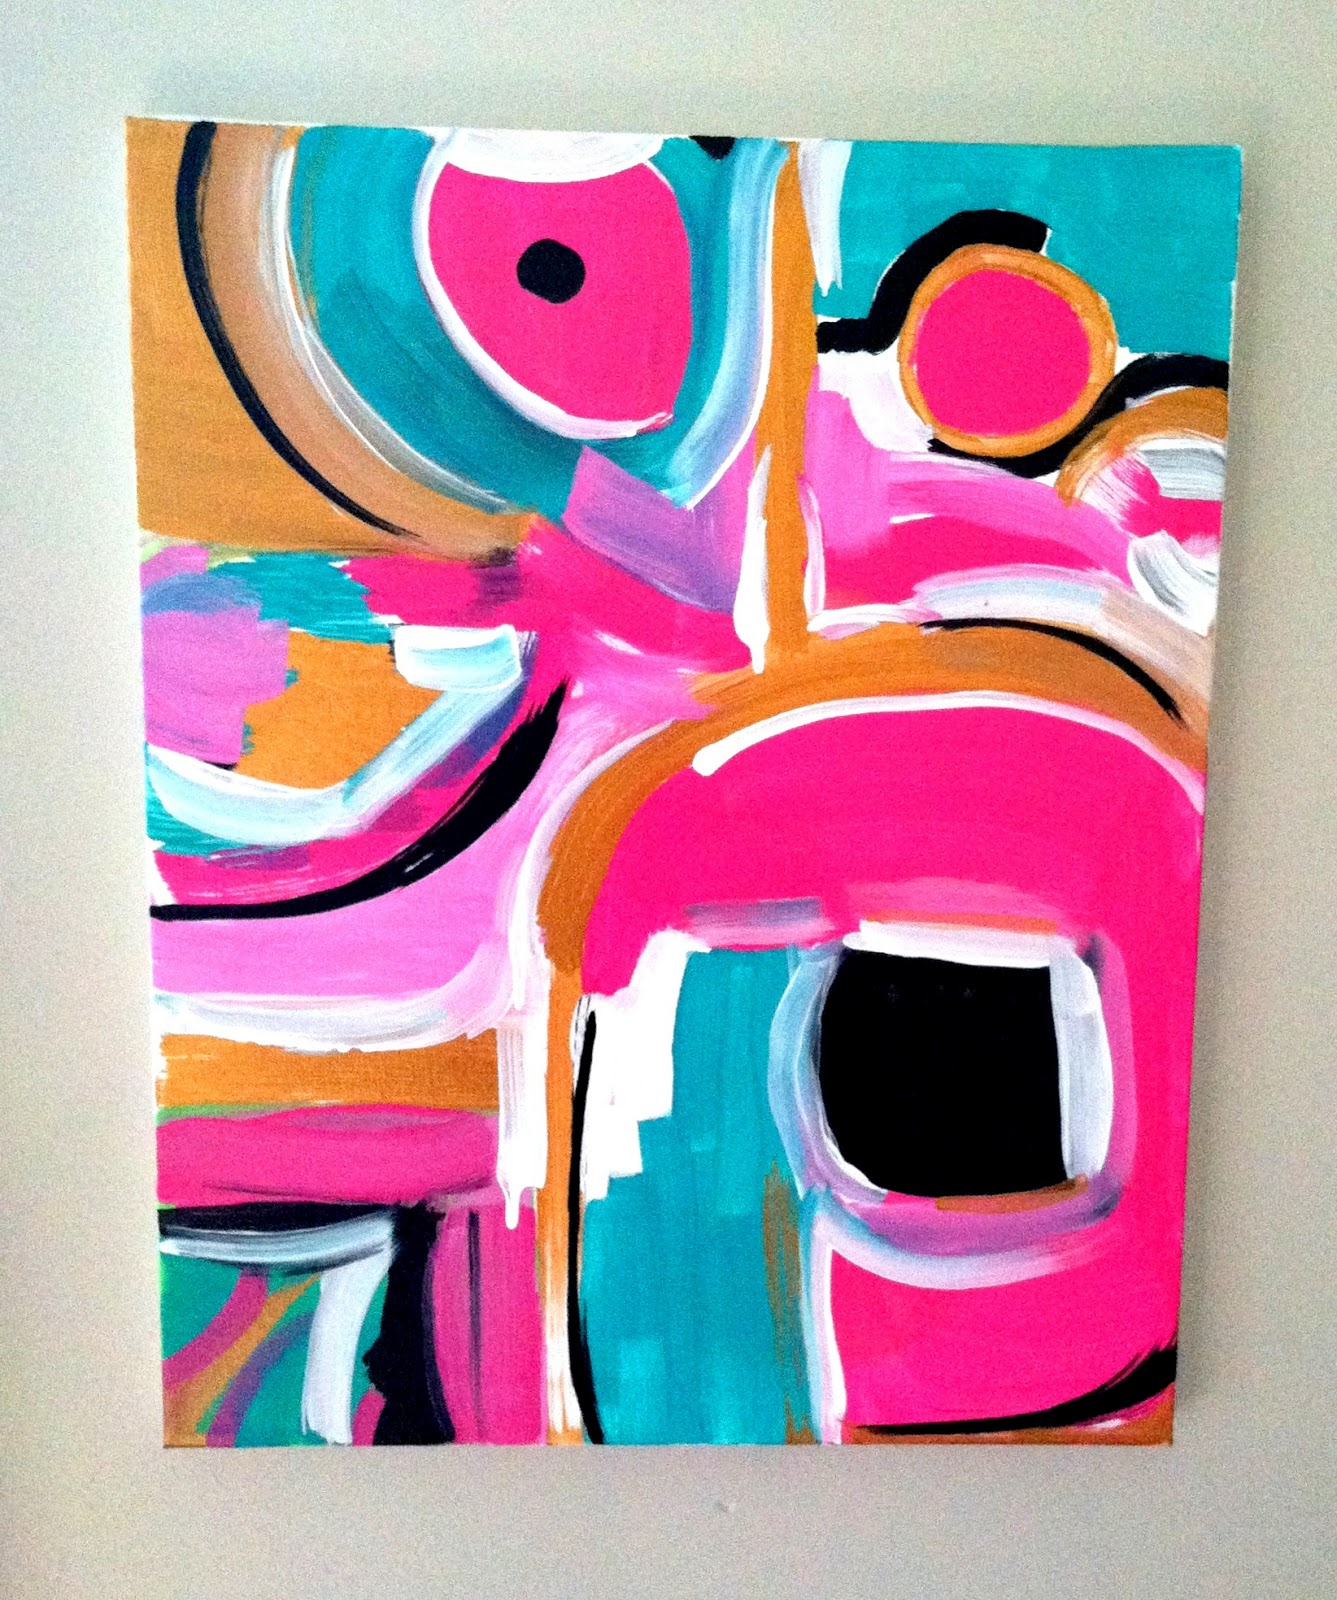 Lakeitha Duncan : DIY ABSTRACT ART